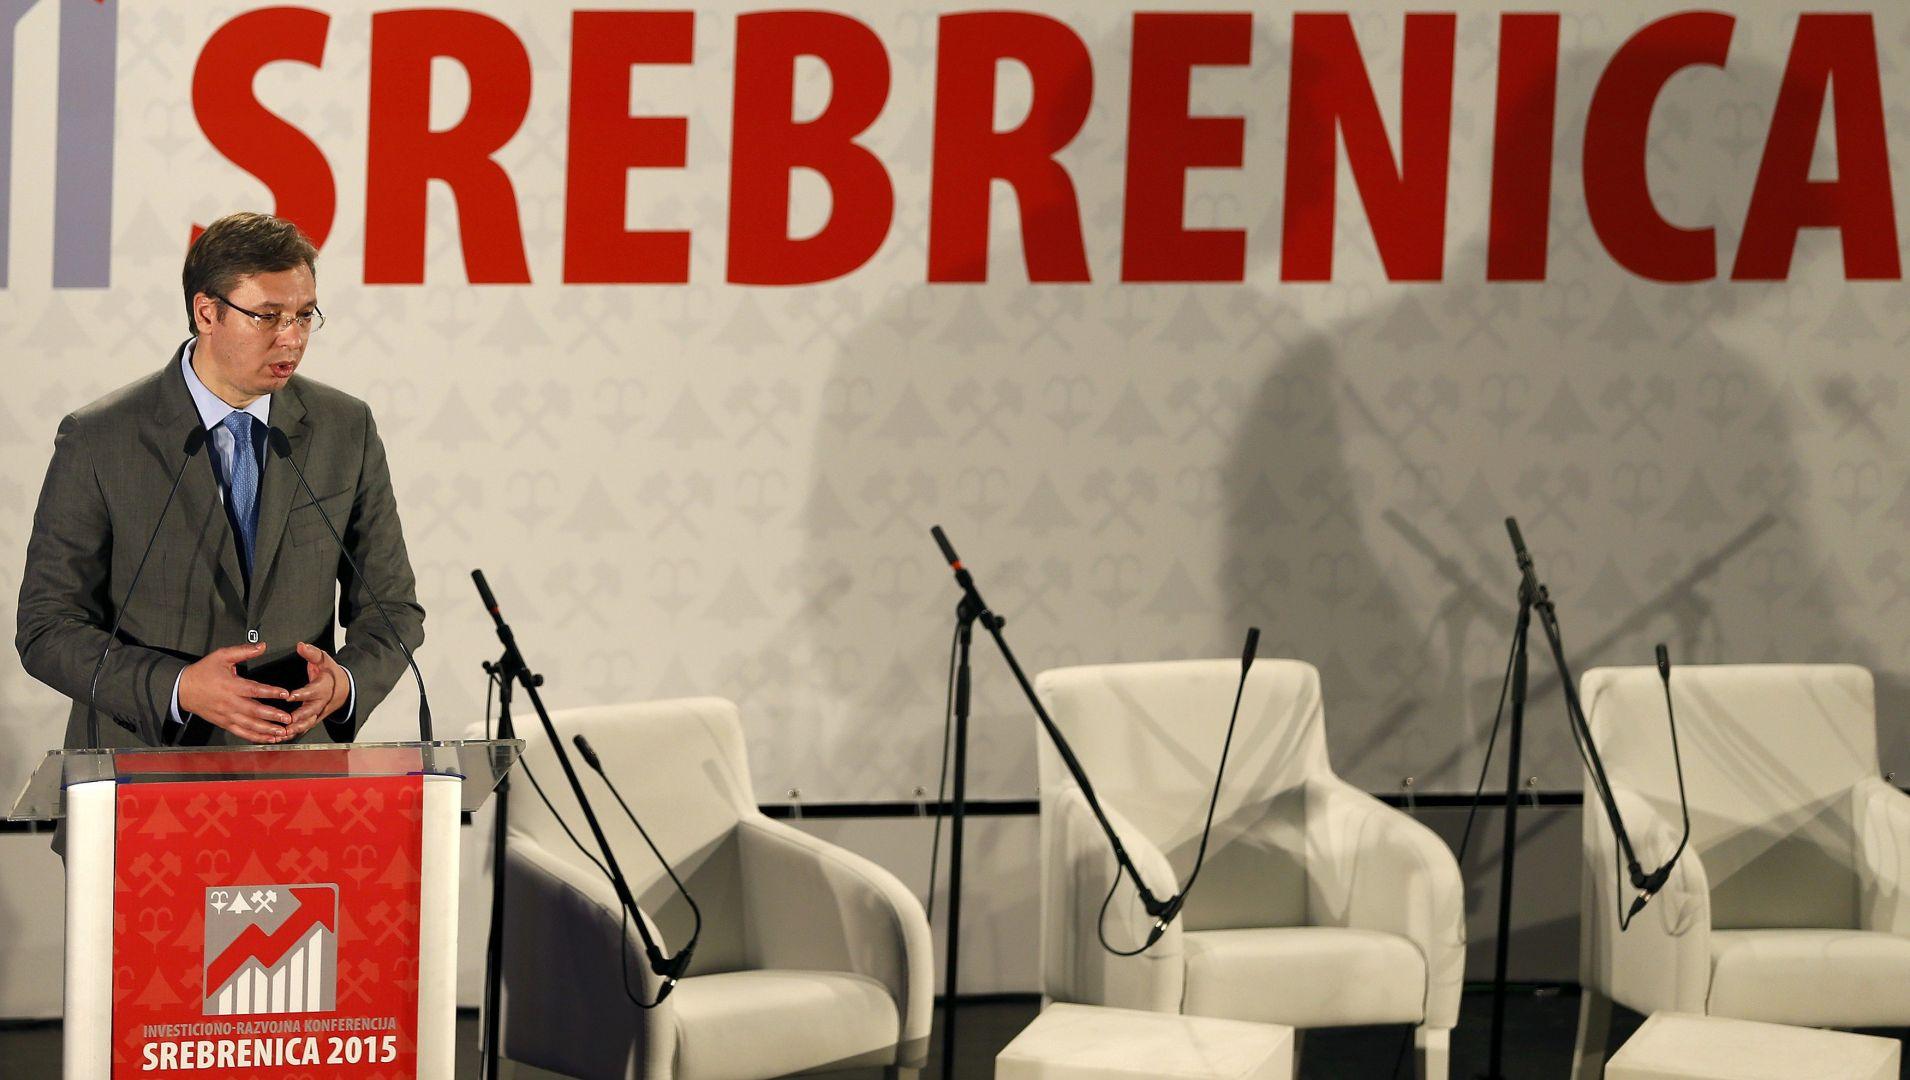 Srebrenica will see better days